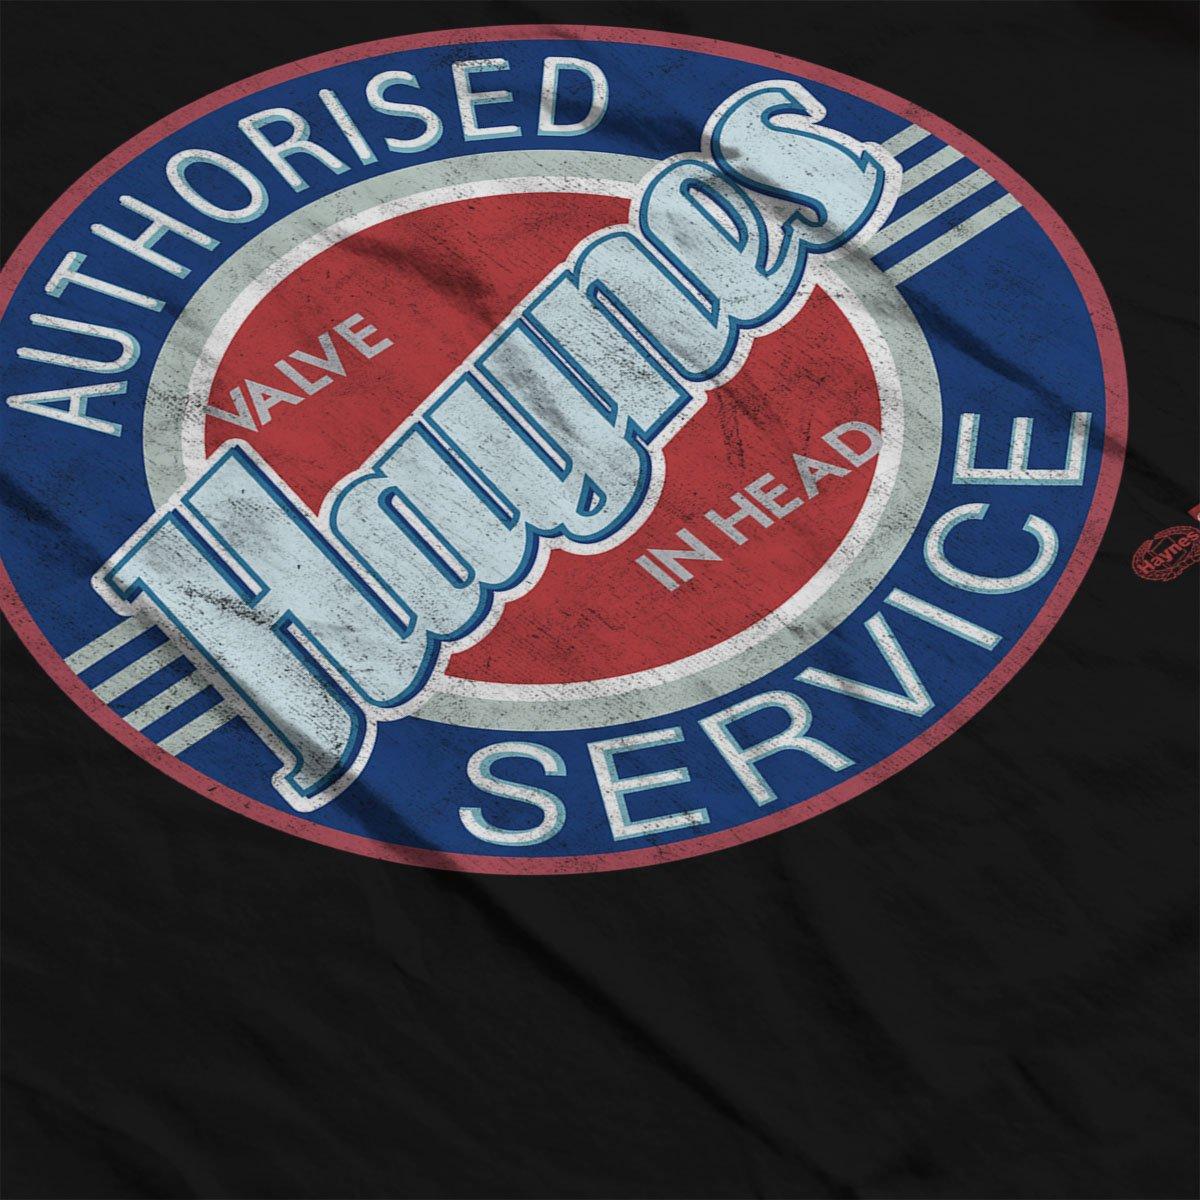 POD66 Haynes Buick Authorised Service Center Womens Vest